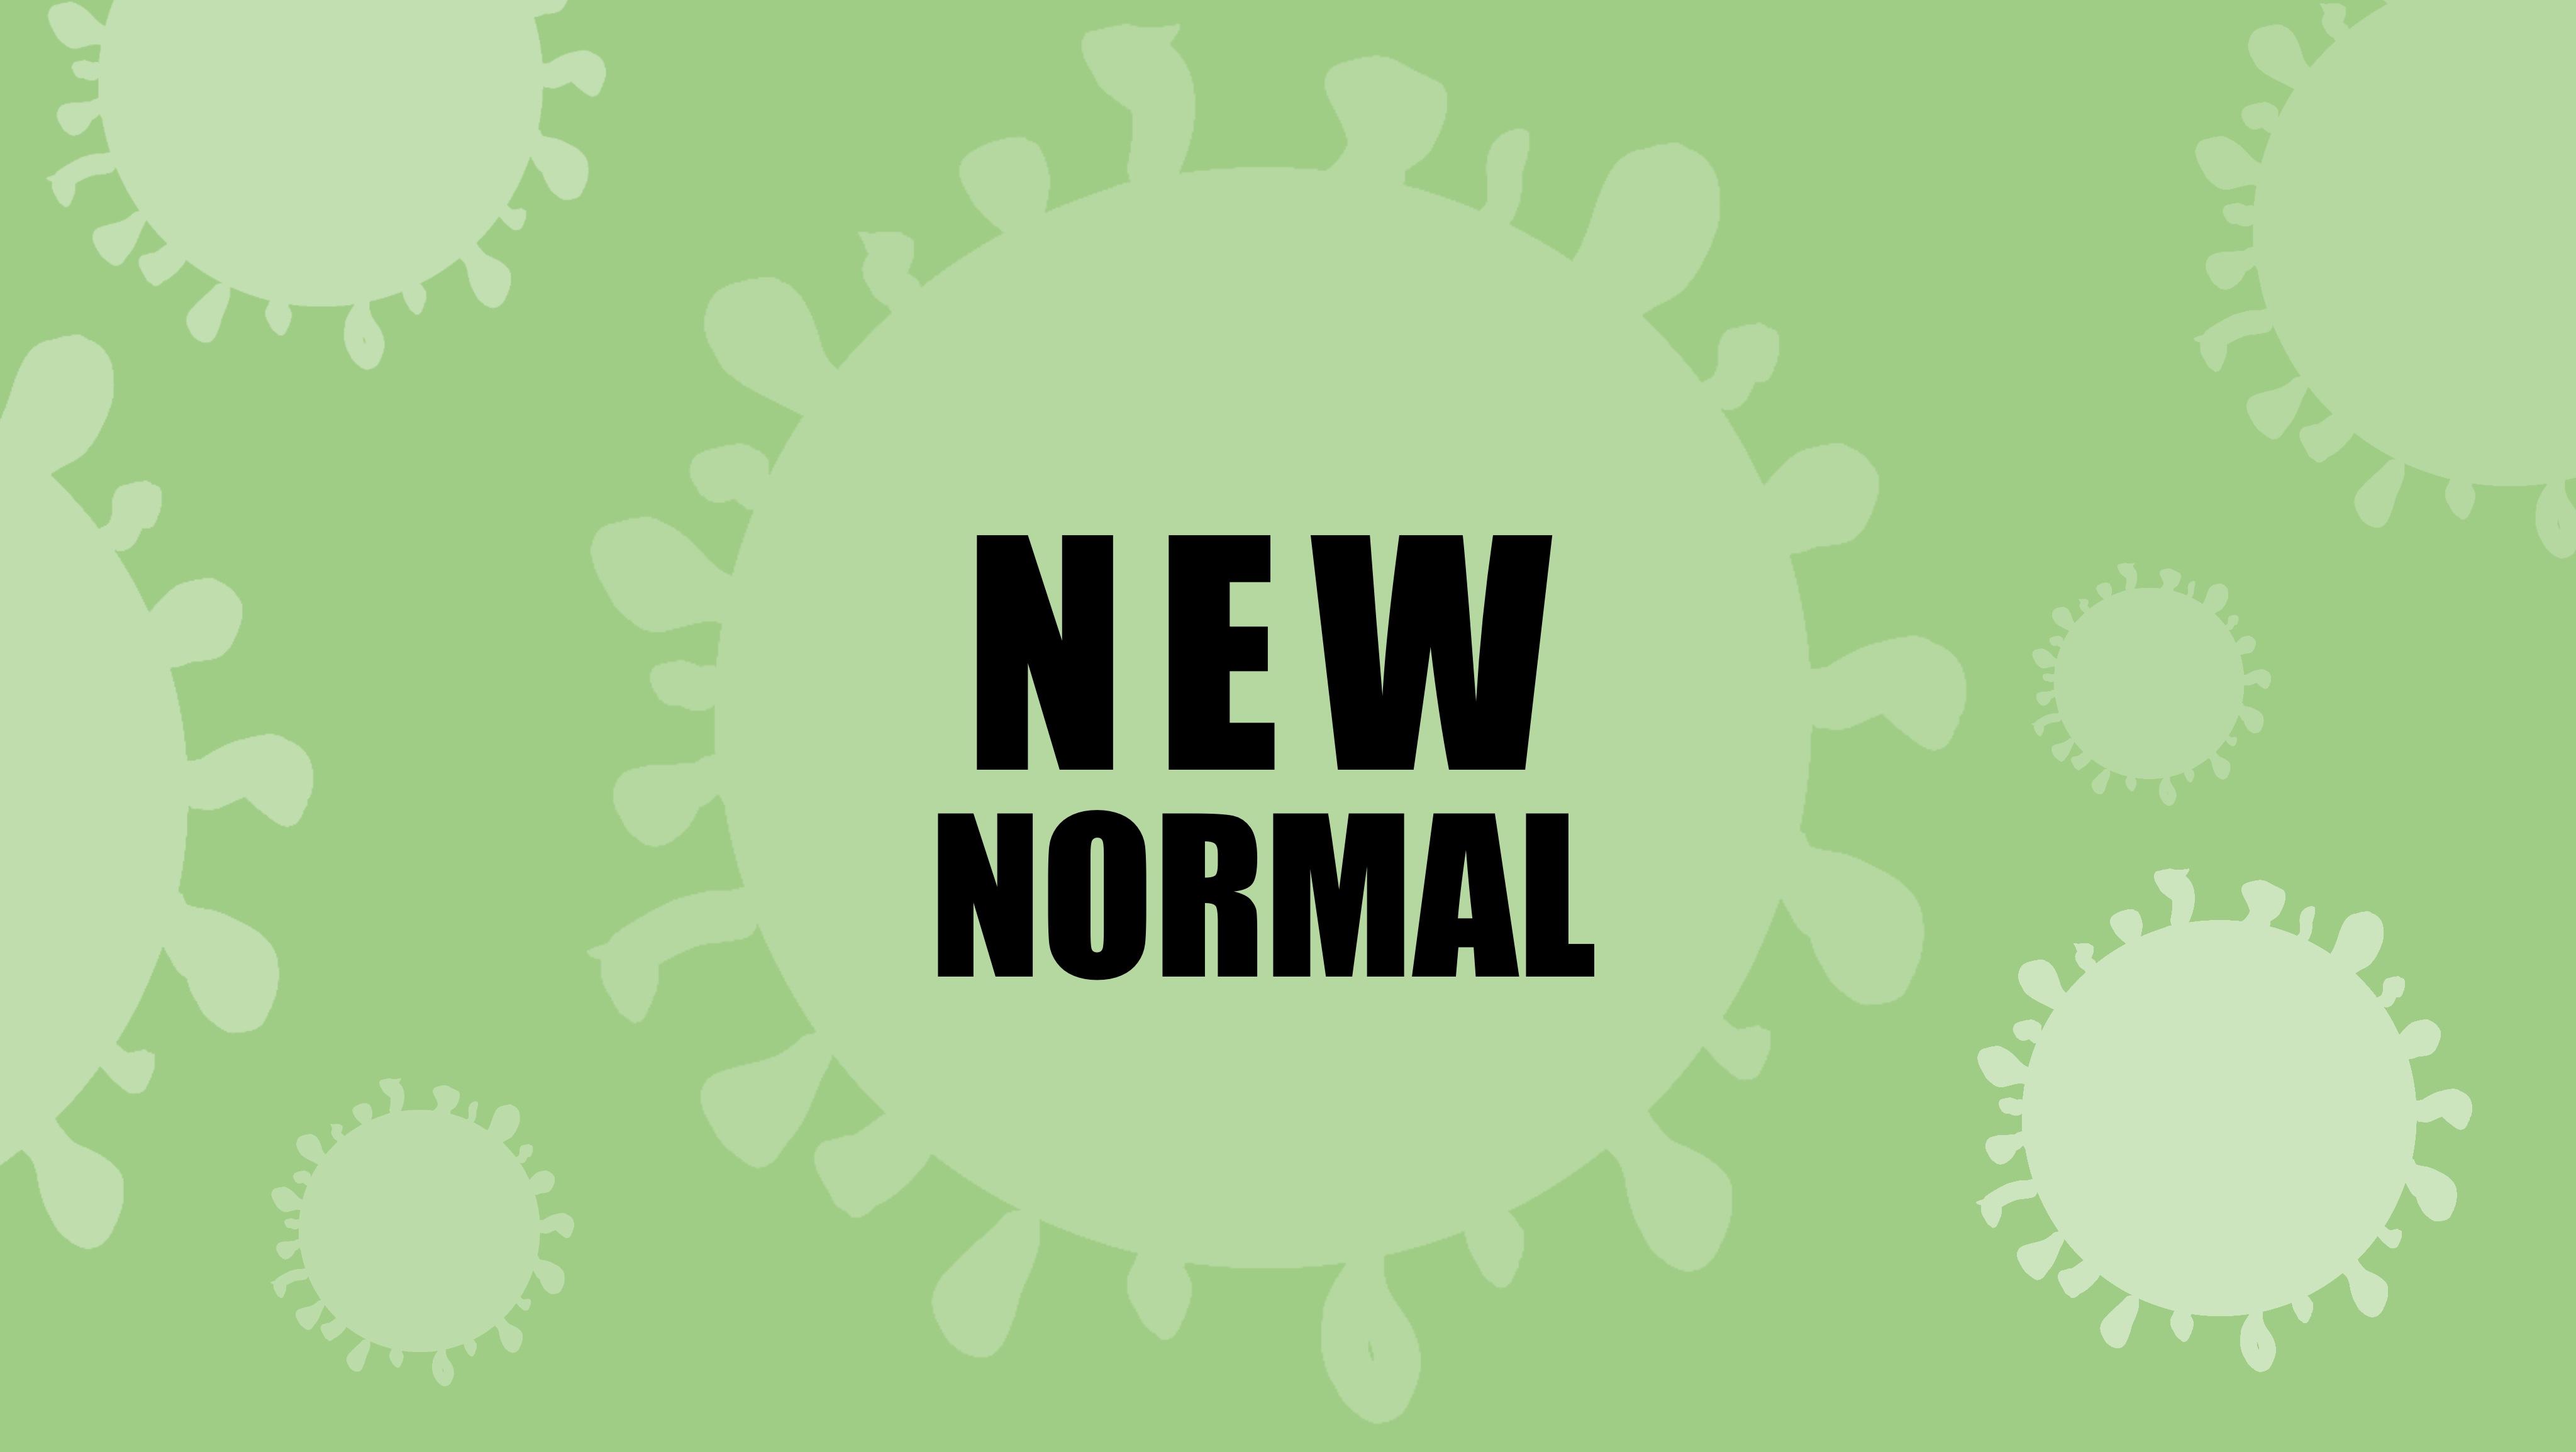 #myrodereel2020  My Rode Reel 2020 - New Normal